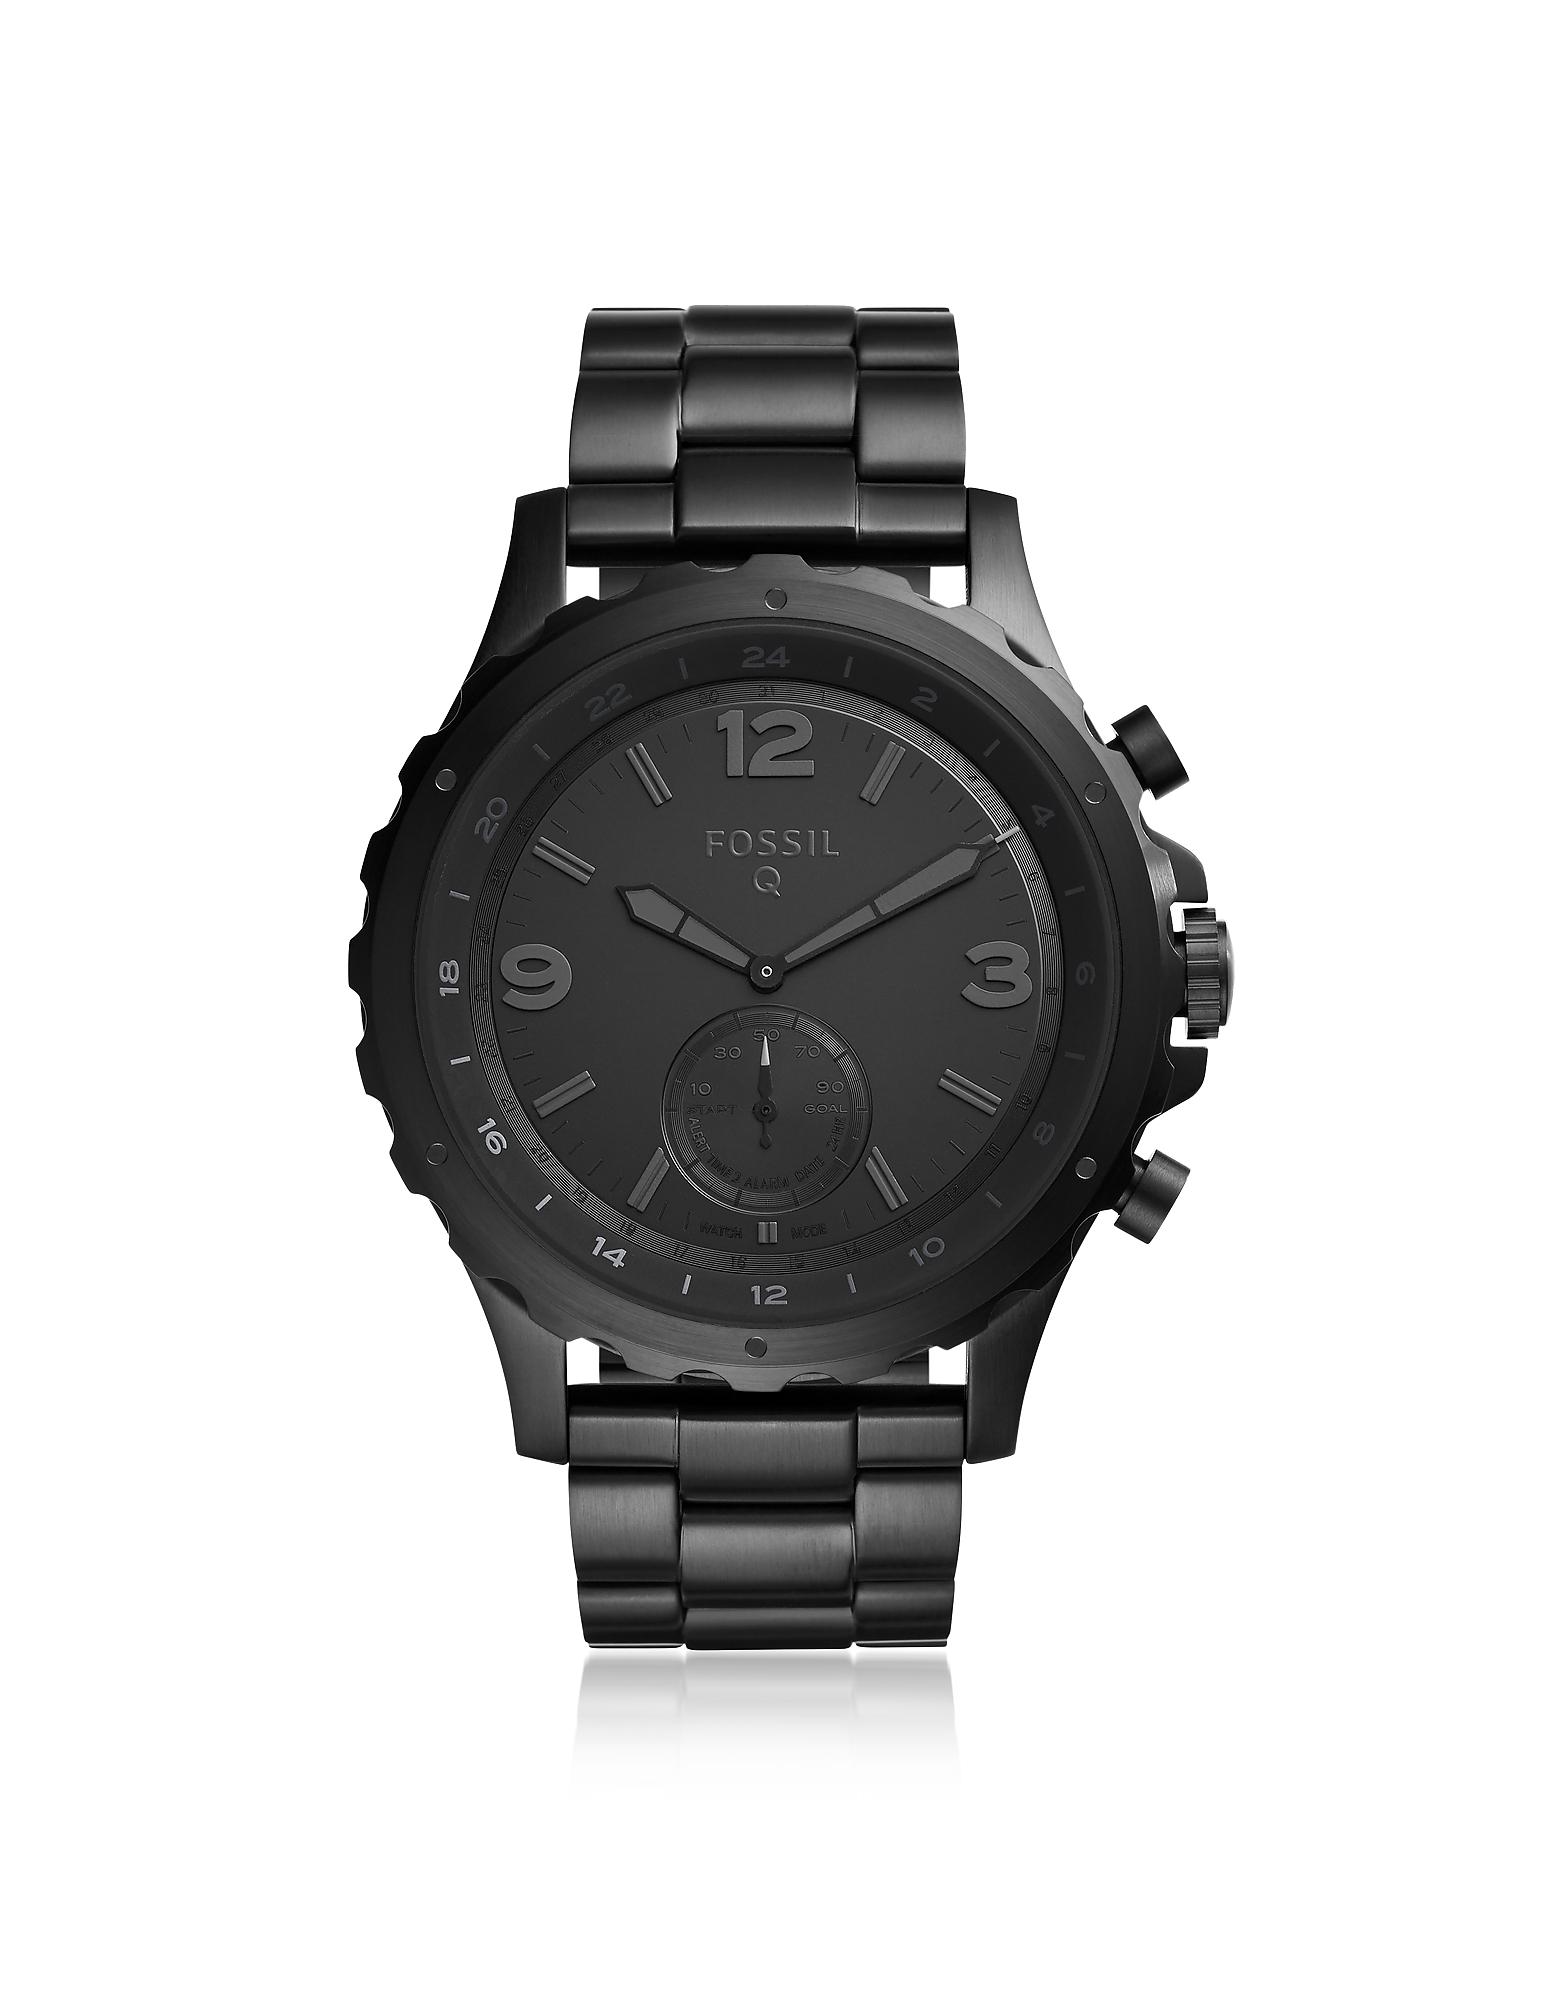 Мужские Часы Смарт FTW1115 Q nate